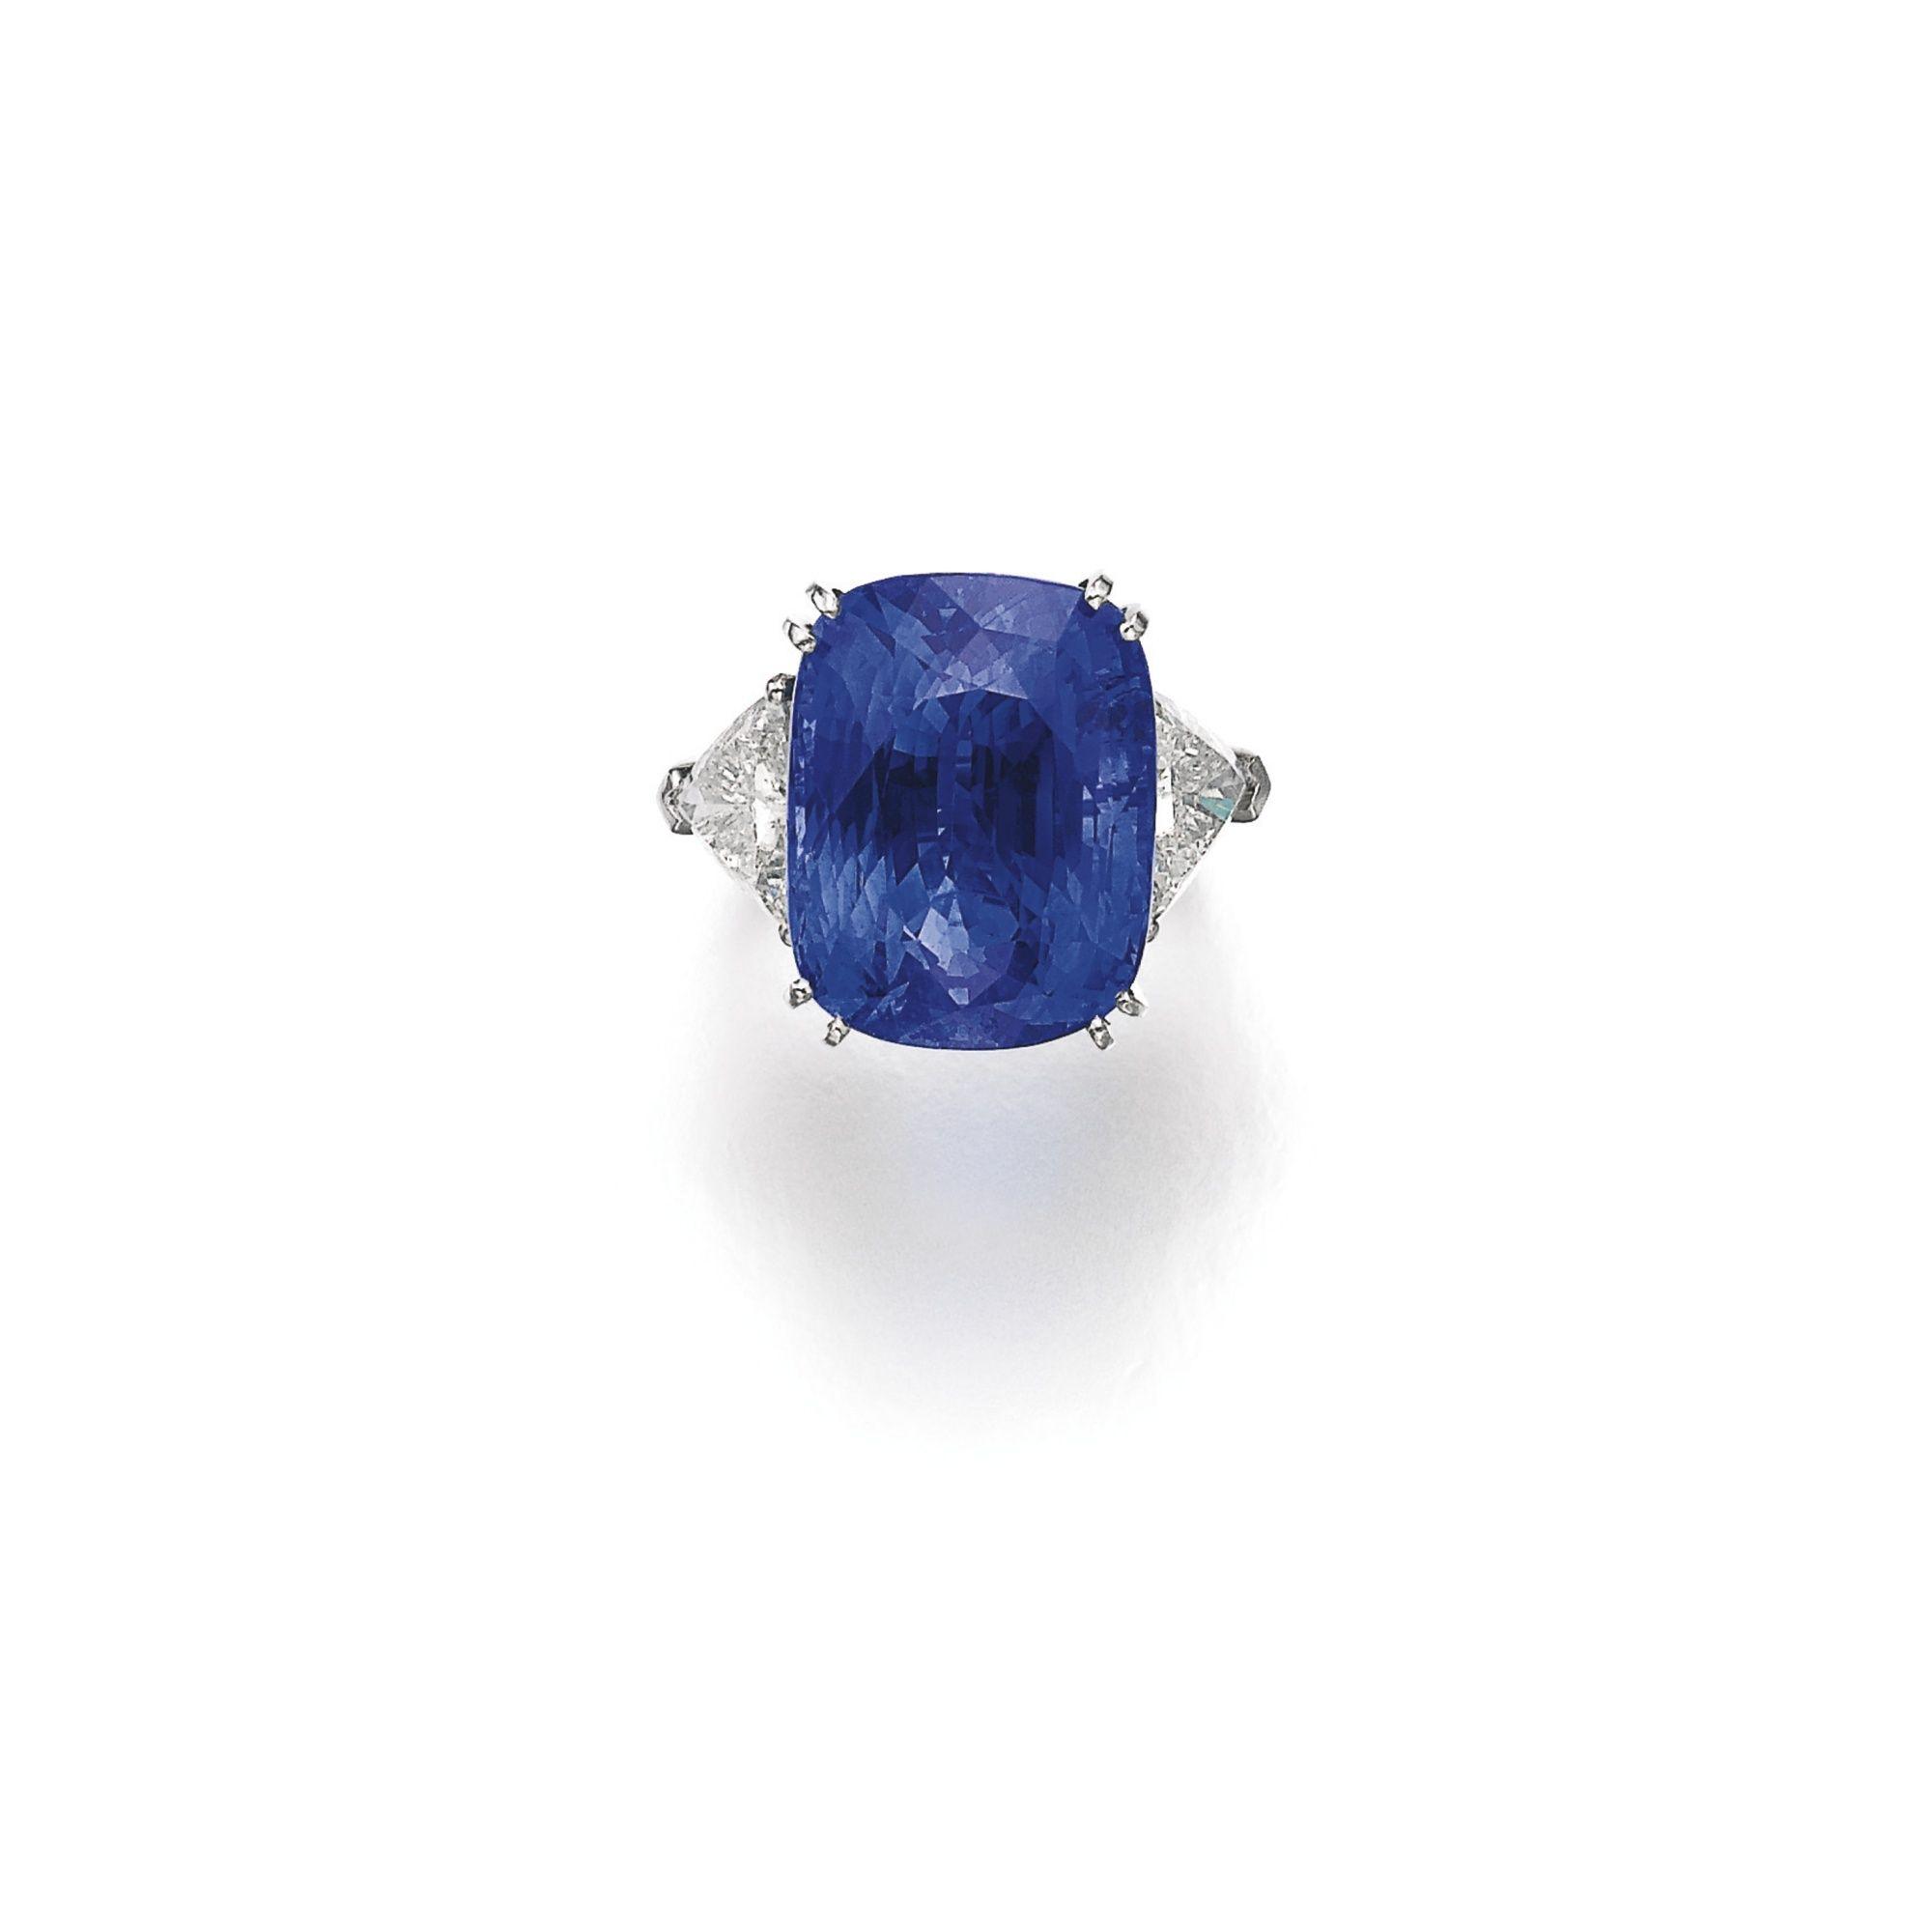 Sapphire And Diamond Ring Set With A Cushion Shaped Sapphire Weighing 36 13 Carats Ceylon Origin No Heat Between Triangular Indigo Jewelry Sapphire Rings